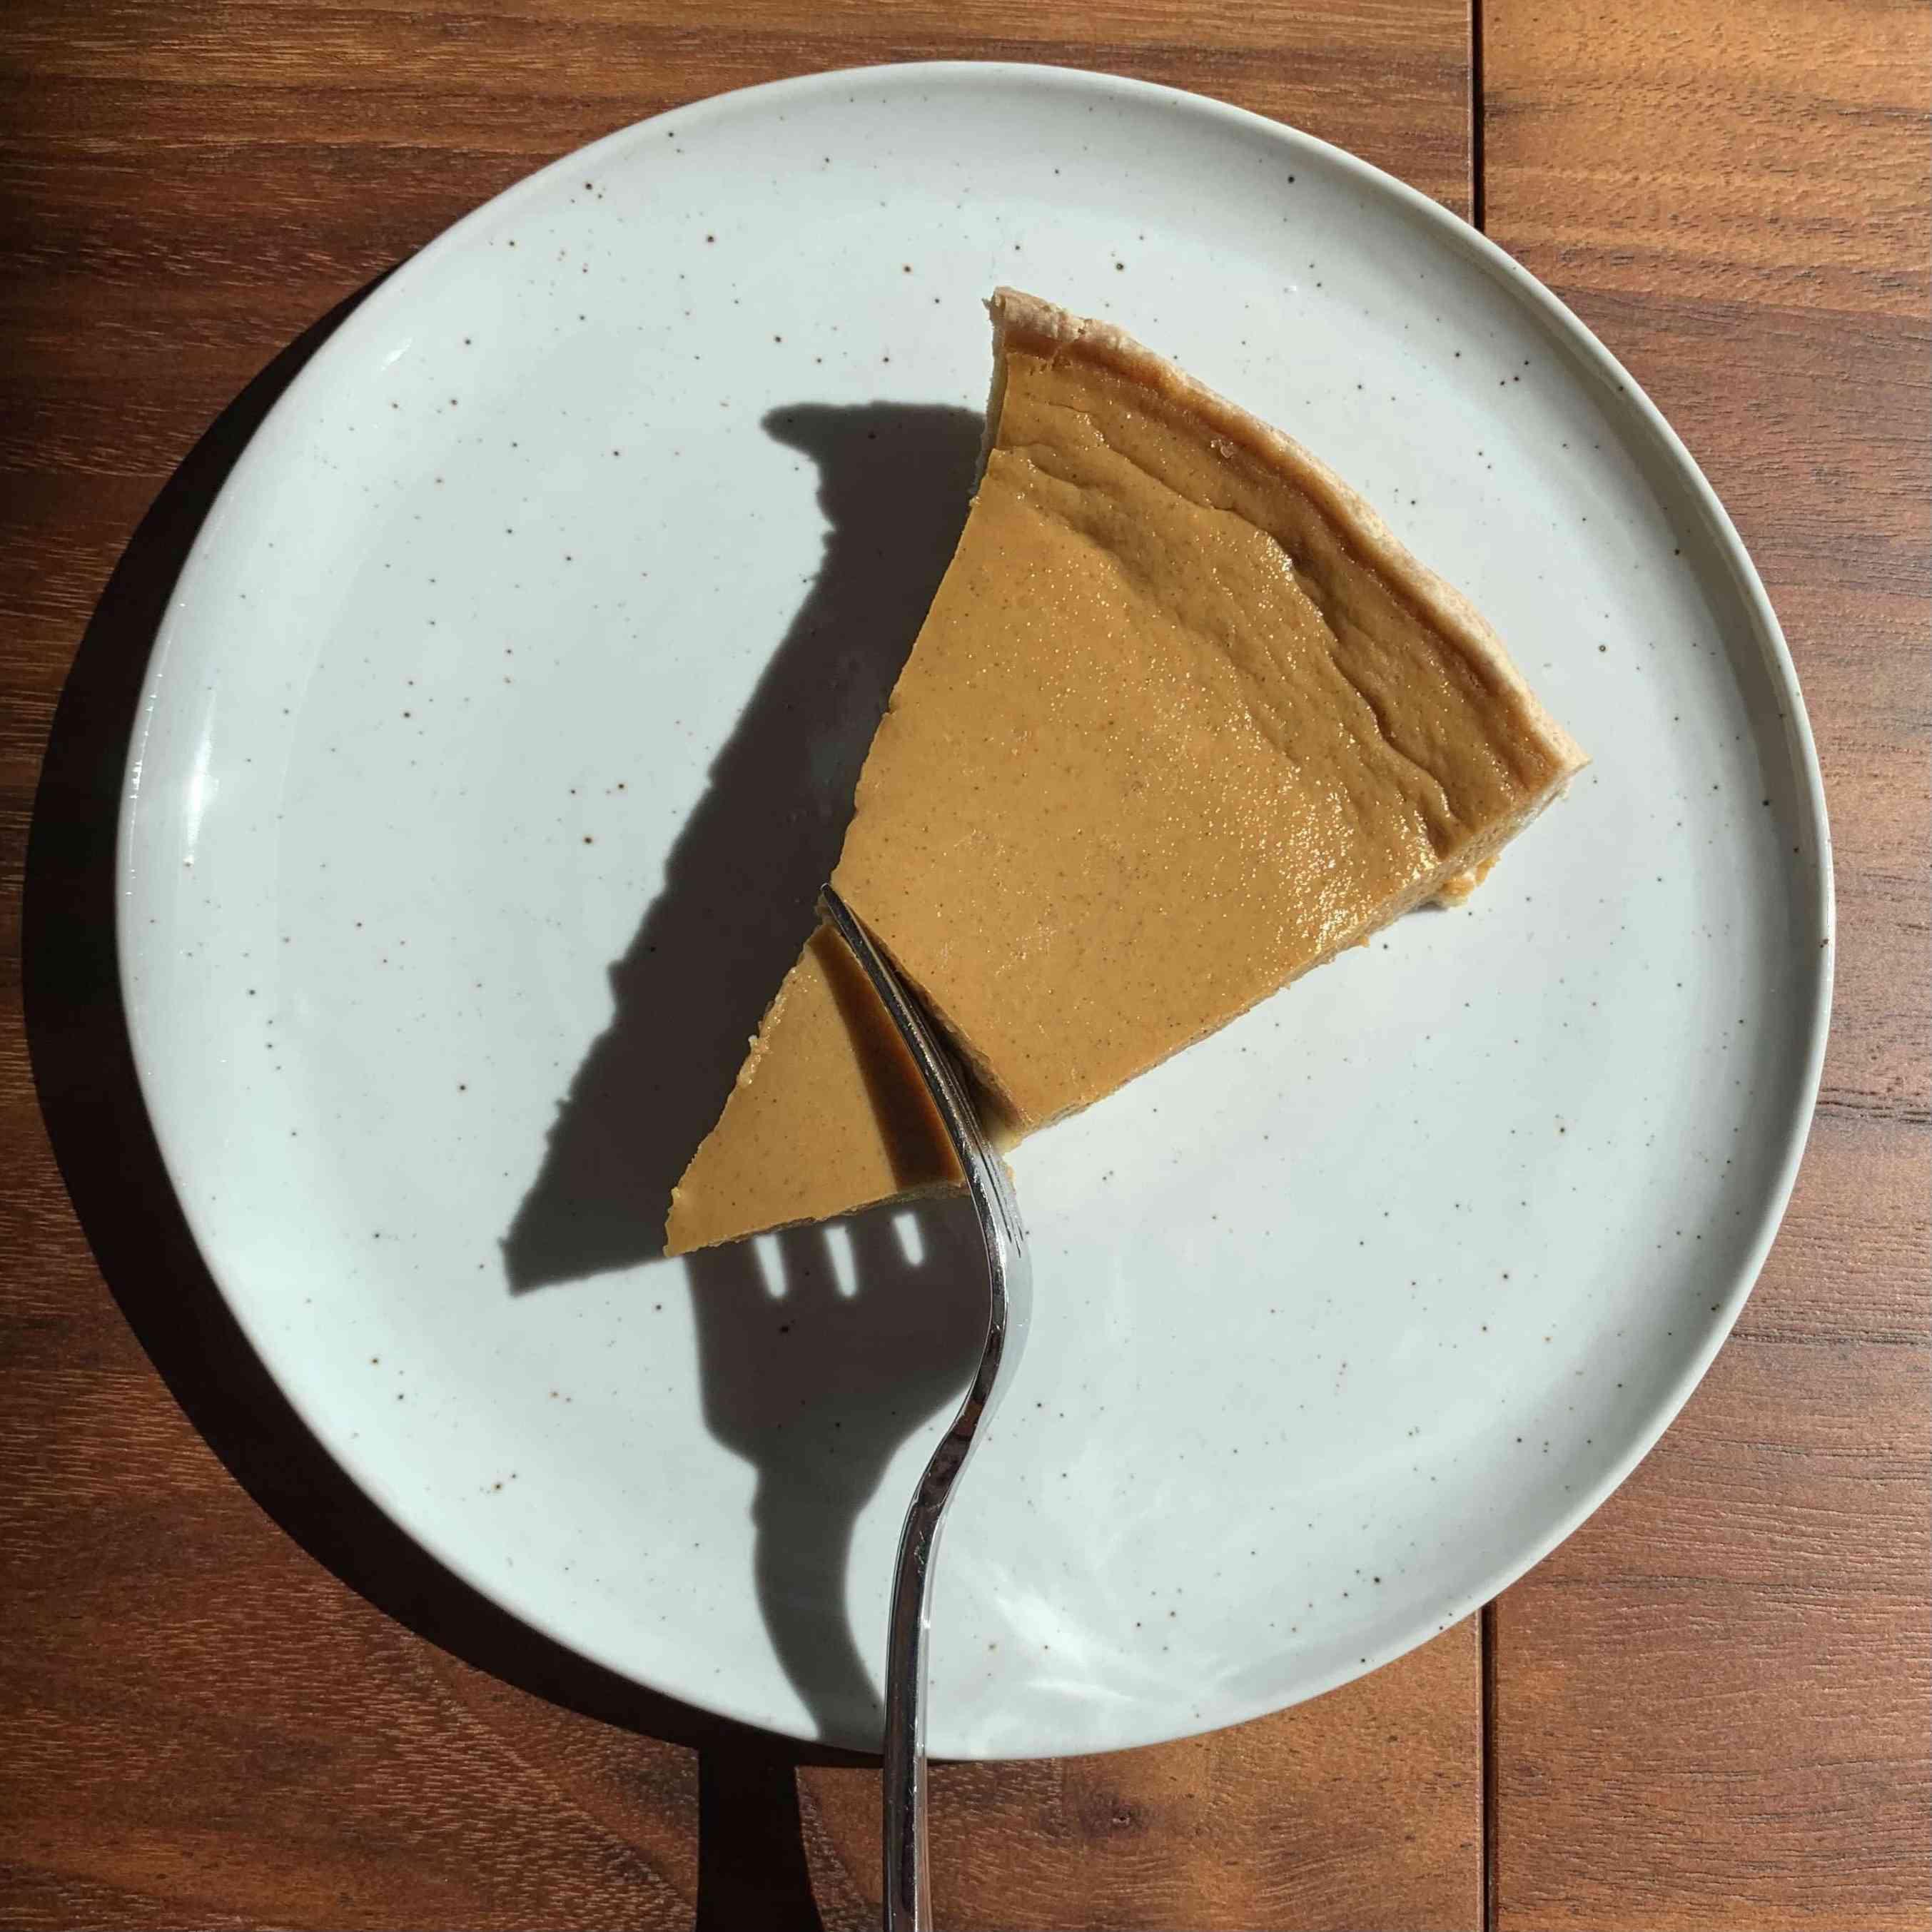 Classic Pumpkin Pie Tester Image